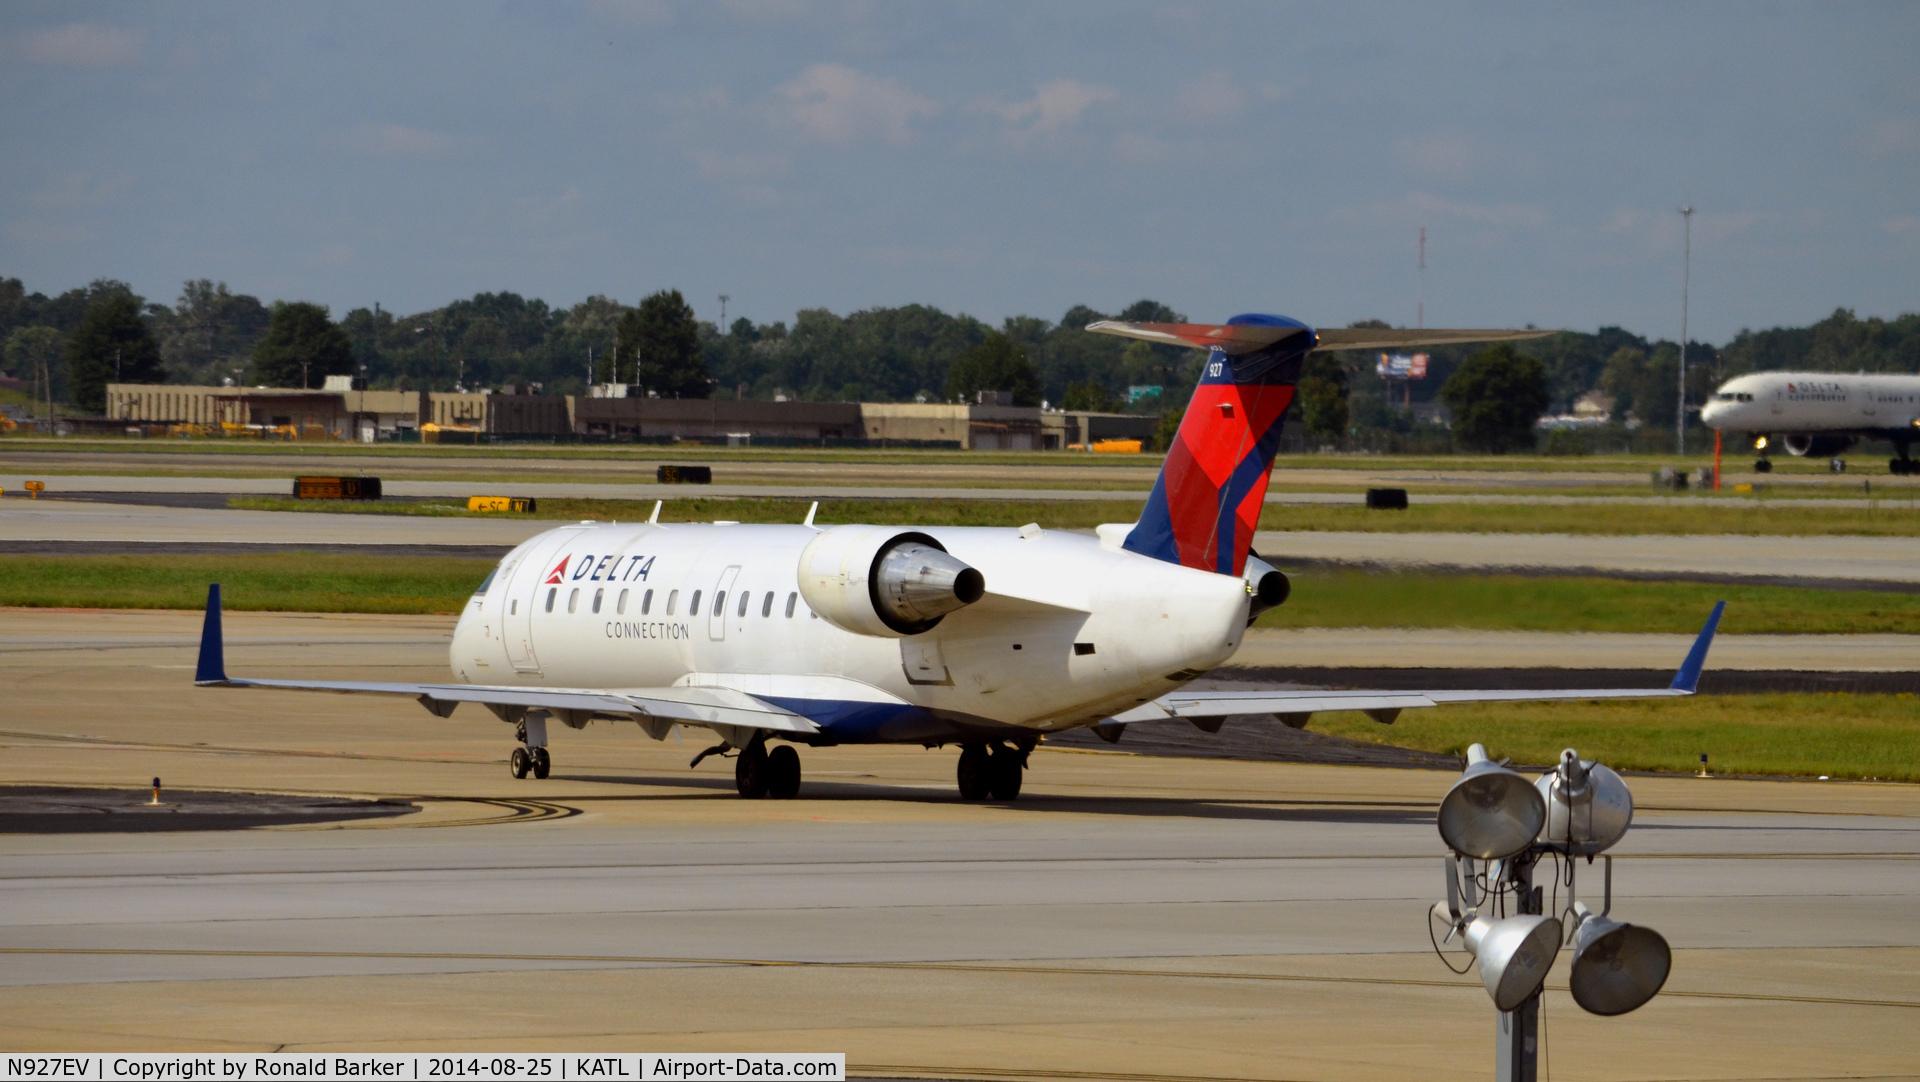 N927EV, 2003 Bombardier CRJ-200ER (CL-600-2B19 C/N 7844, Taxi Atlanta